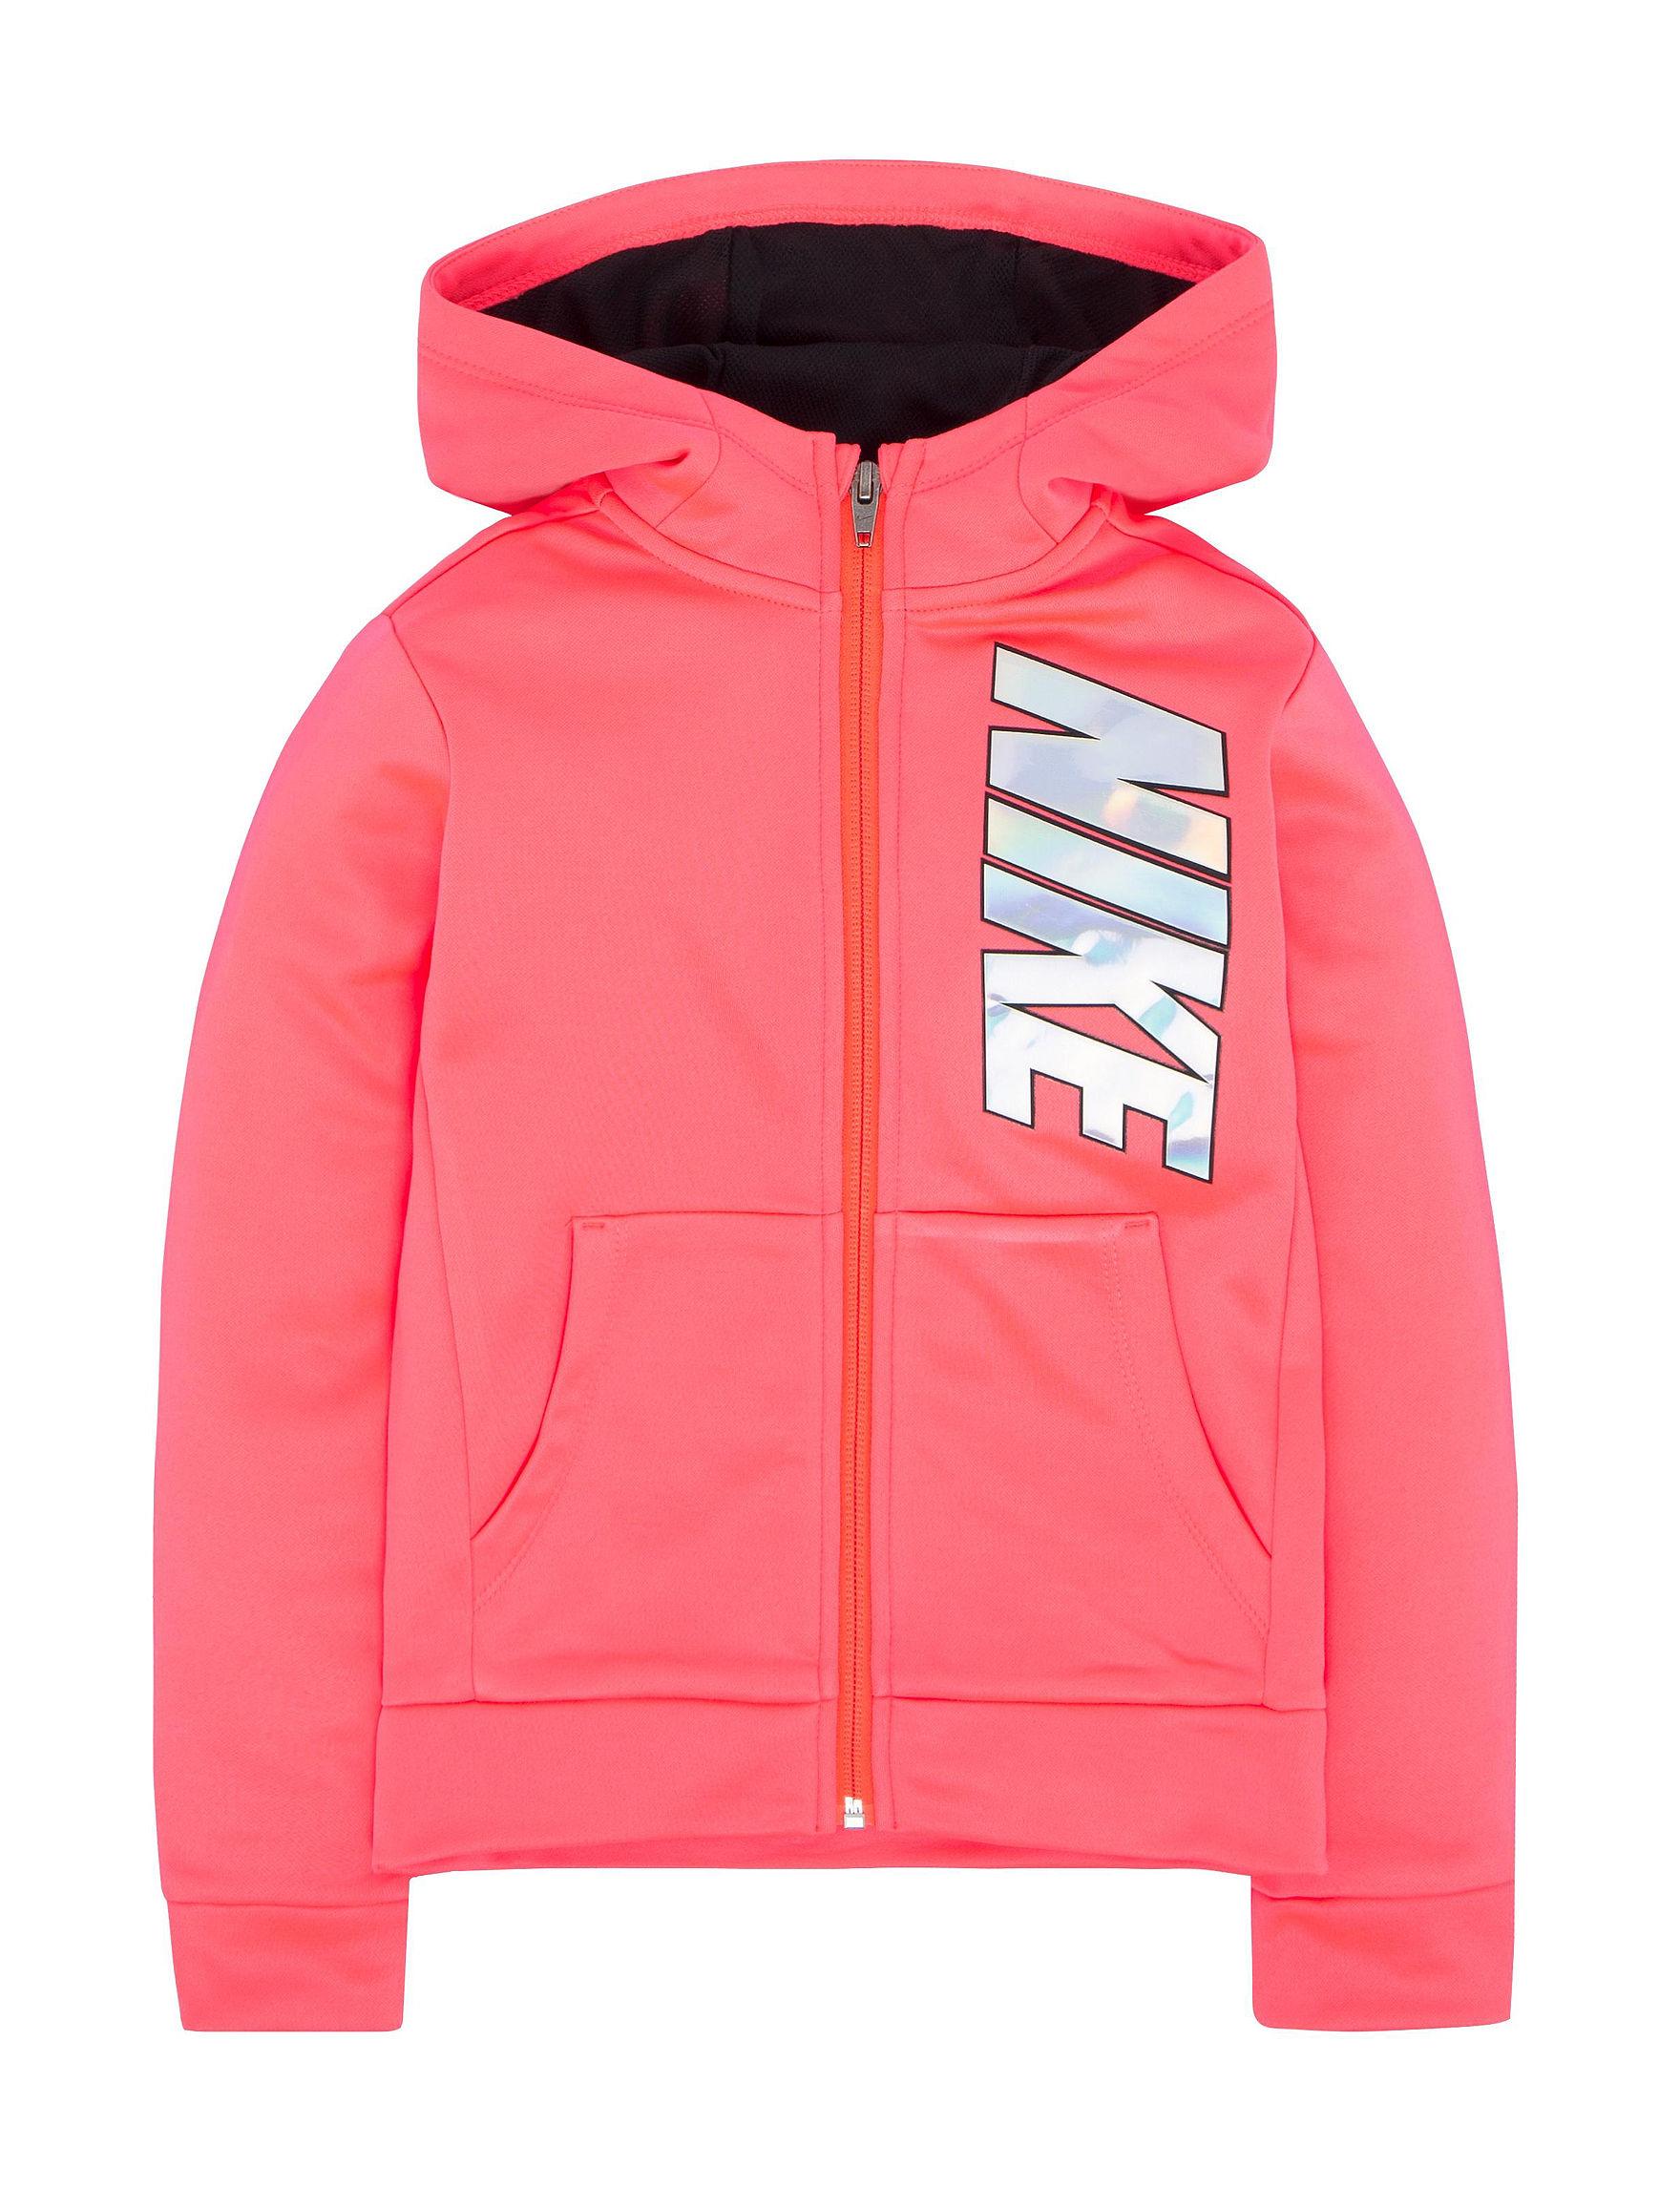 Nike Pink Fleece & Soft Shell Jackets